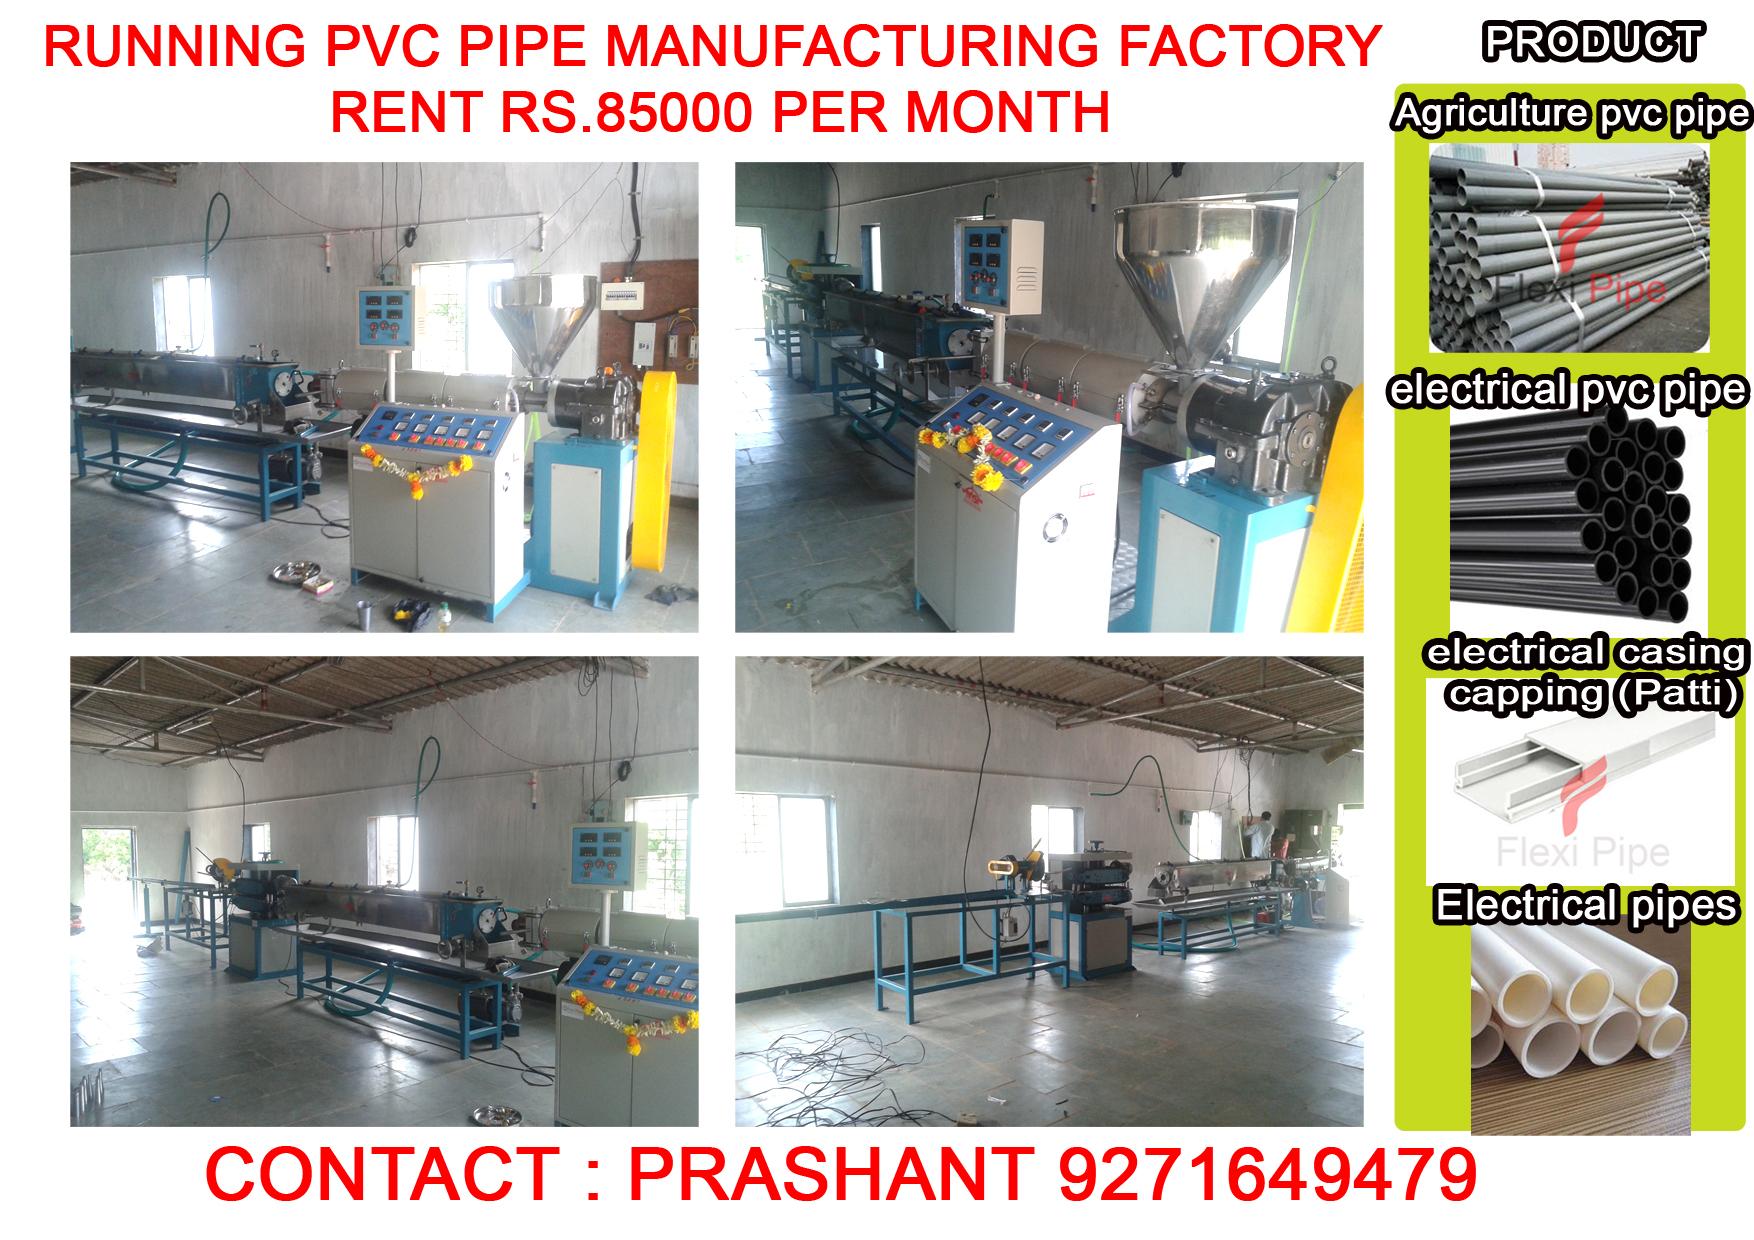 Pvc Pipe Manufacturing Unit for Lease in Alibag, Maharashtra